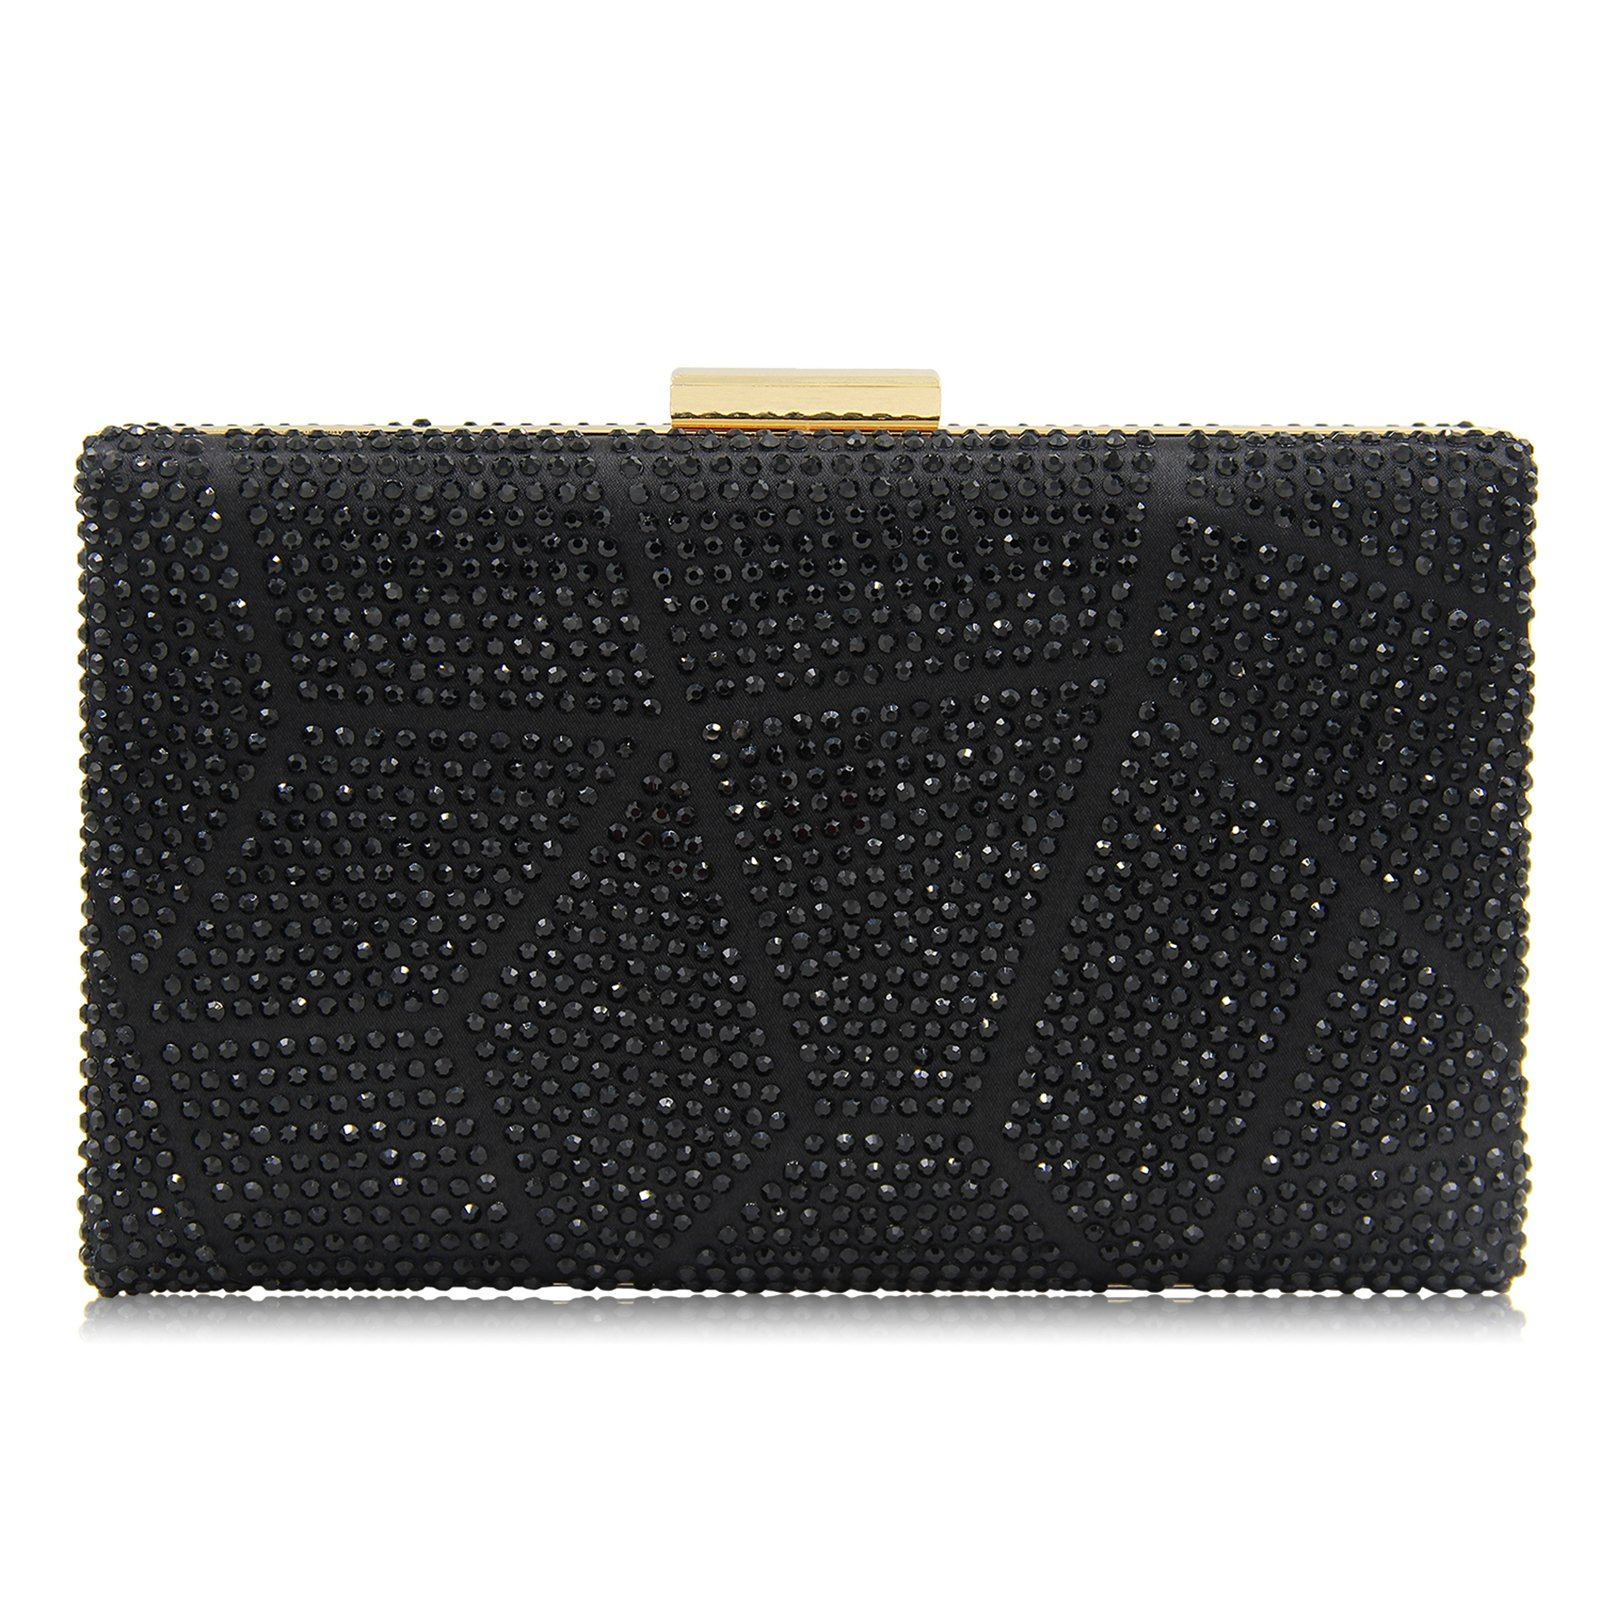 Women Clutches Crystal Evening Bags Clutch Purse Party Wedding Handbags (Black)